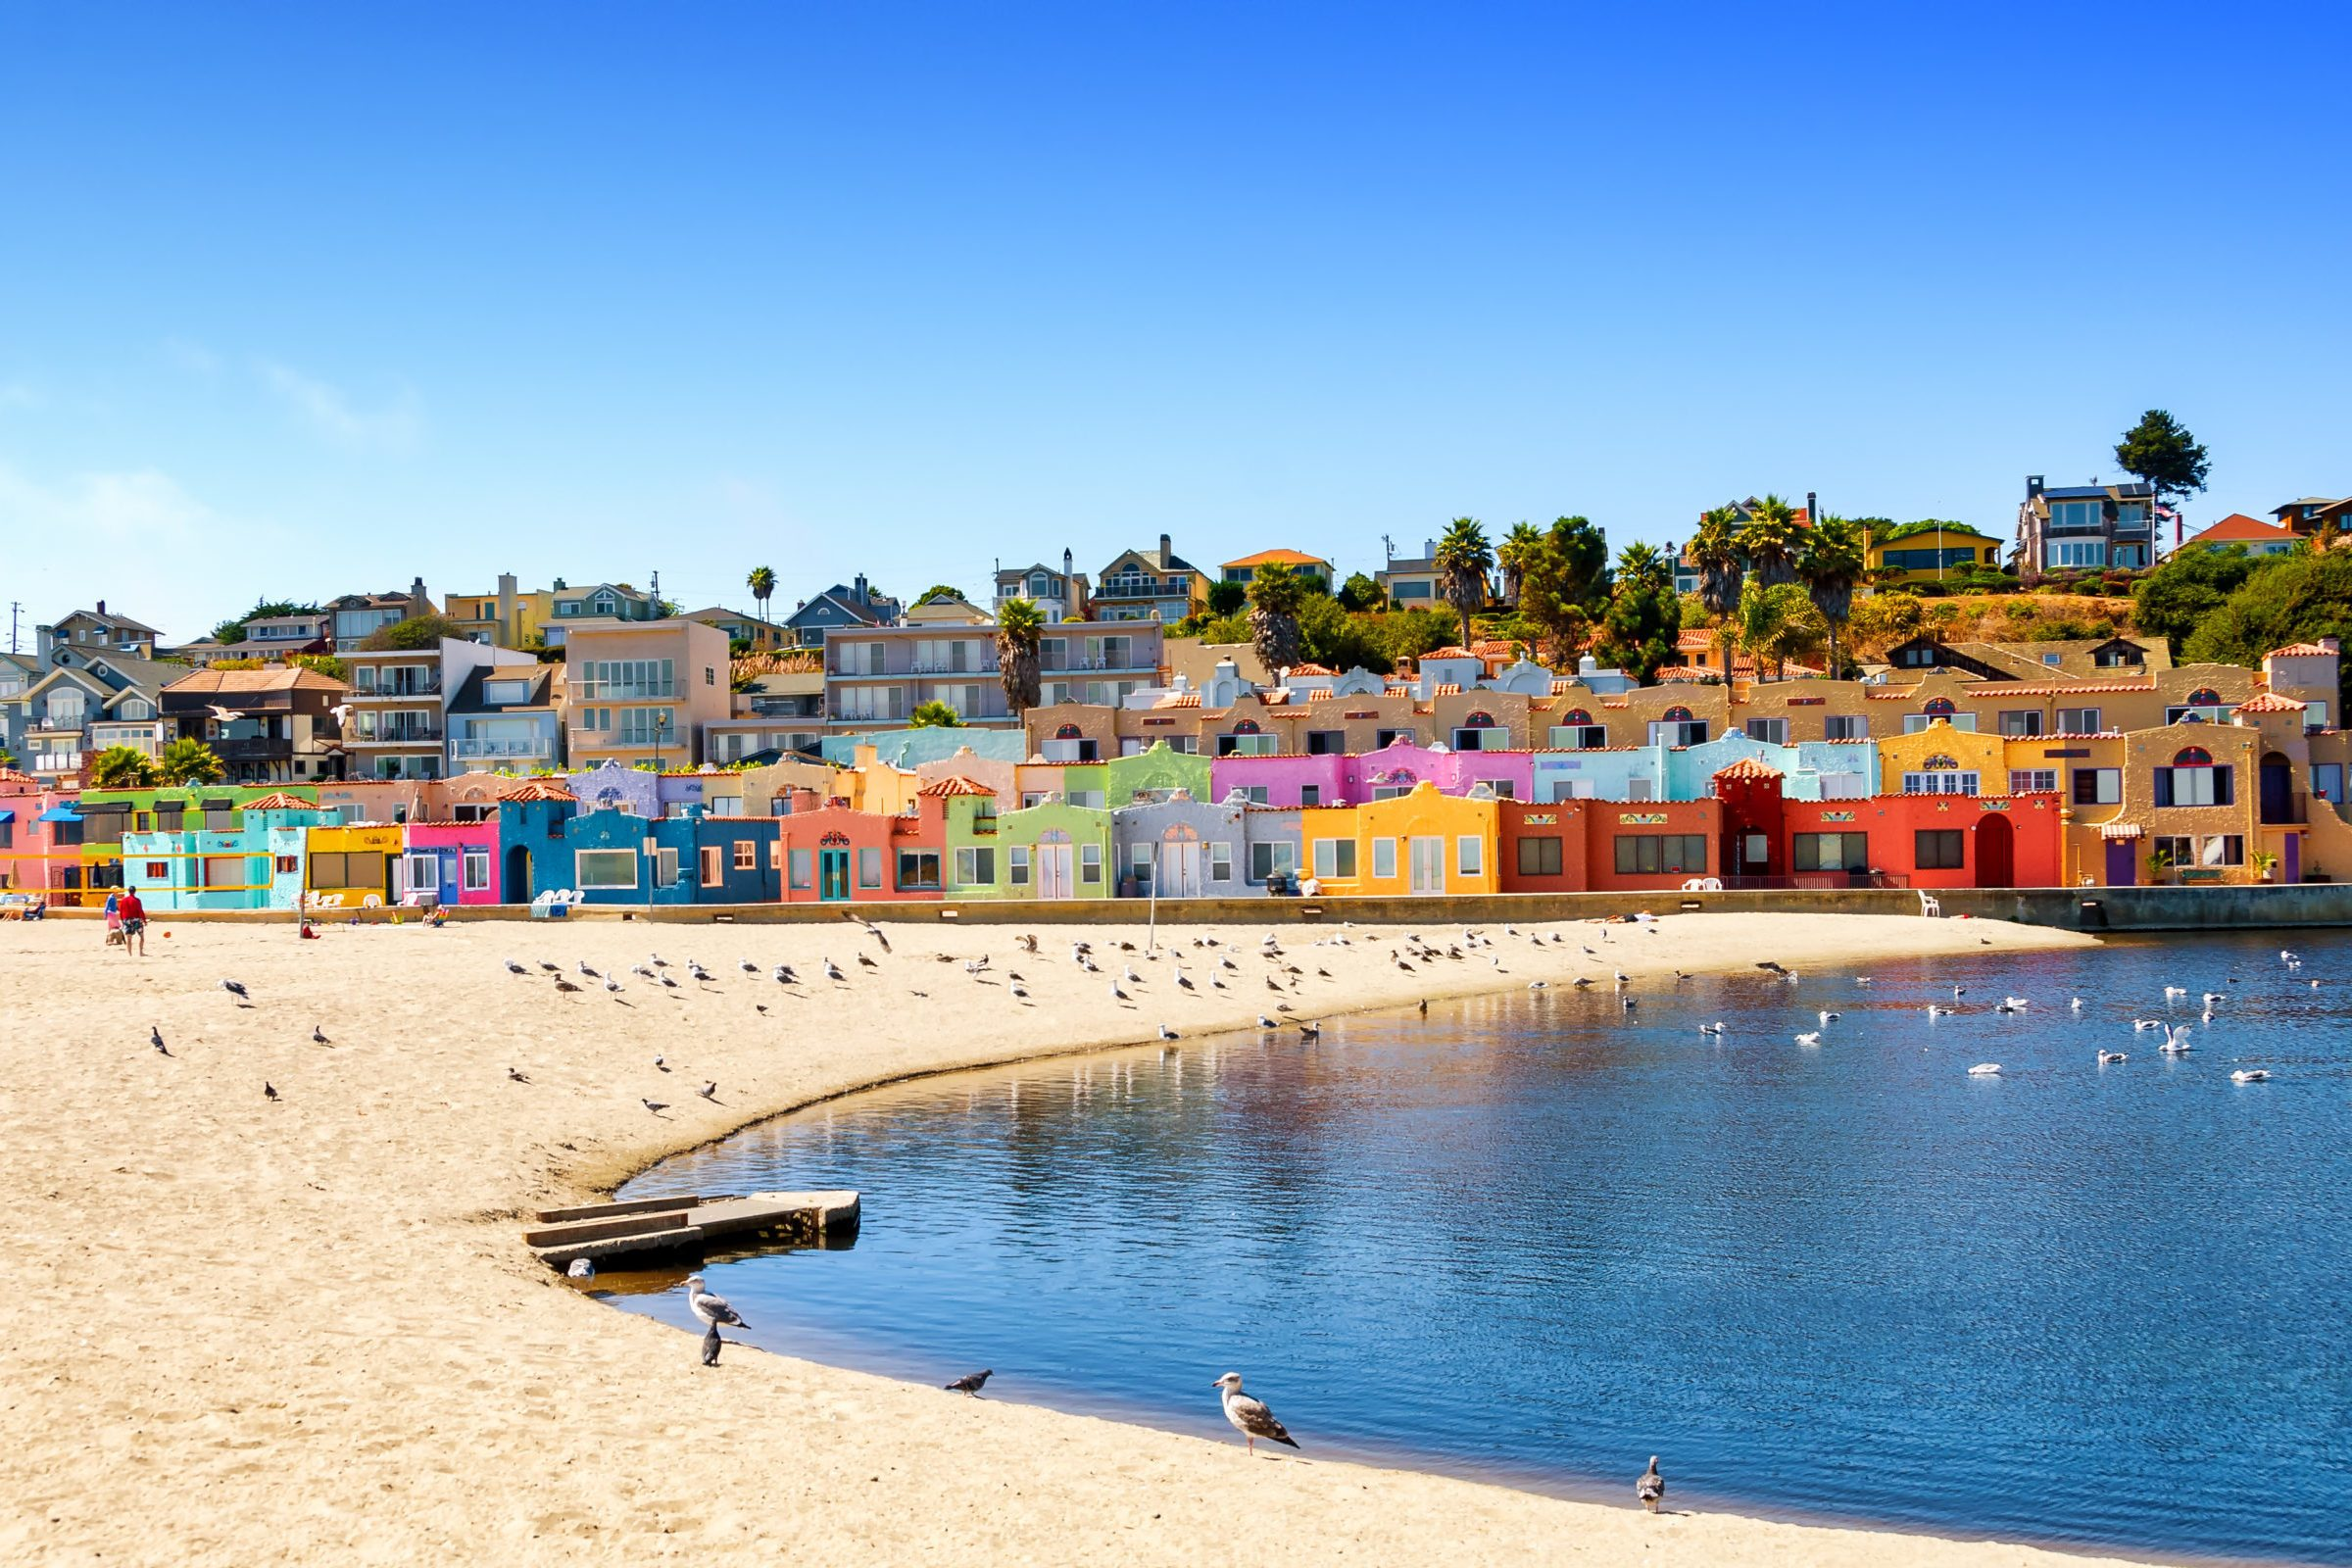 Colorful residential neighborhood in Capitola beach, on the California coast